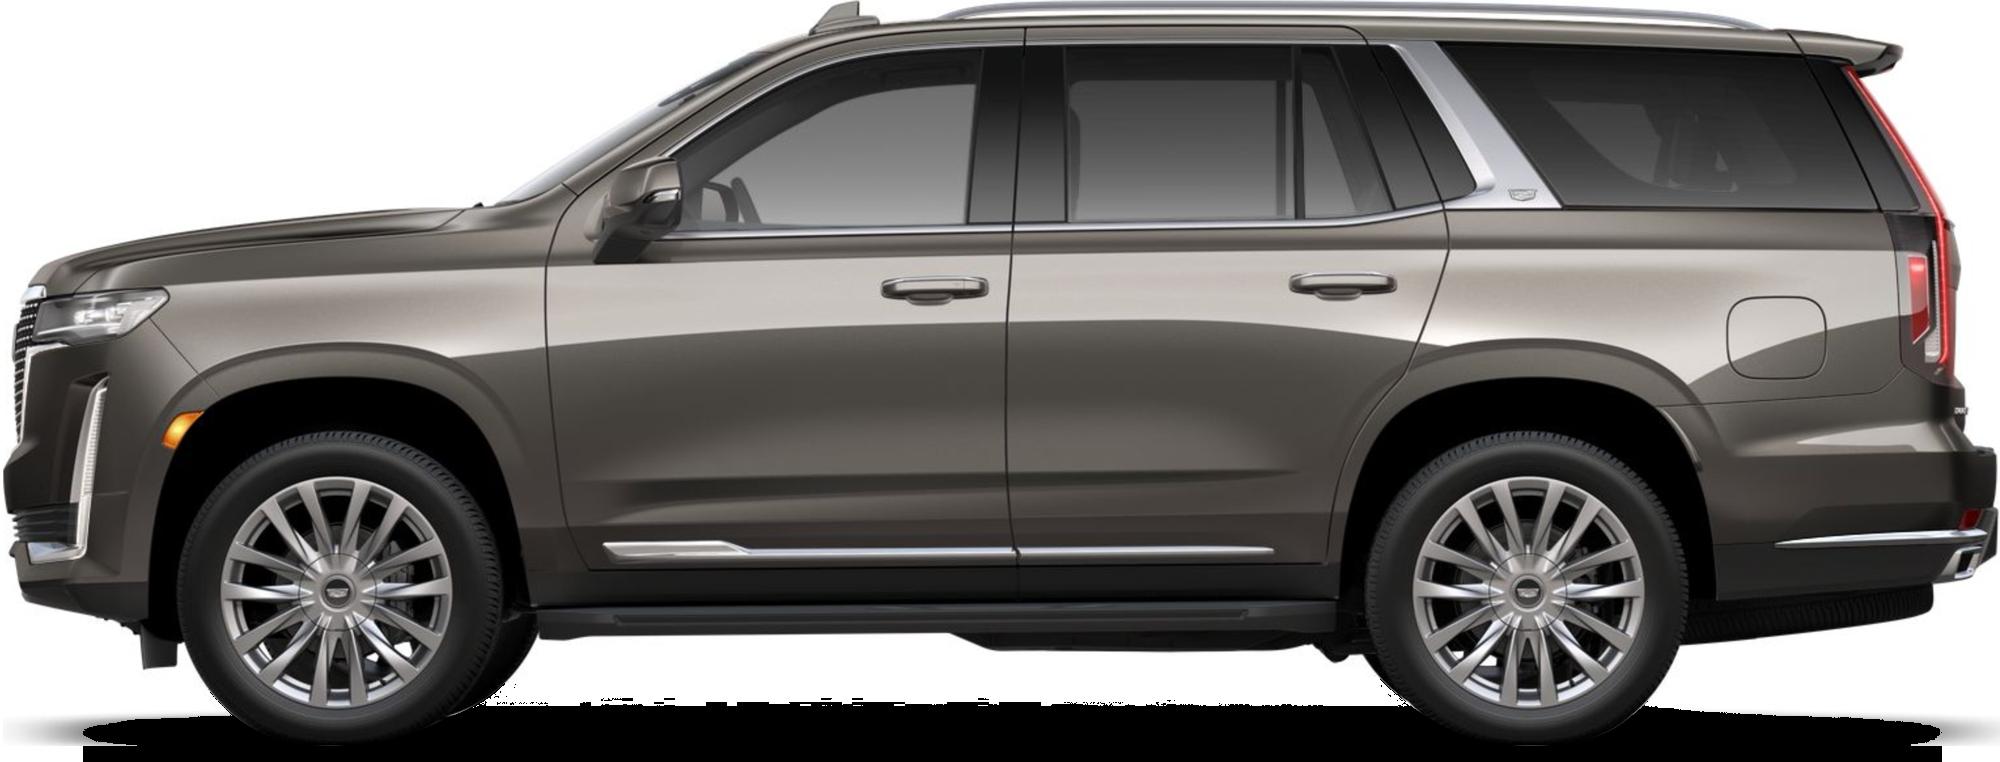 2021 CADILLAC Escalade SUV Luxury 4x4